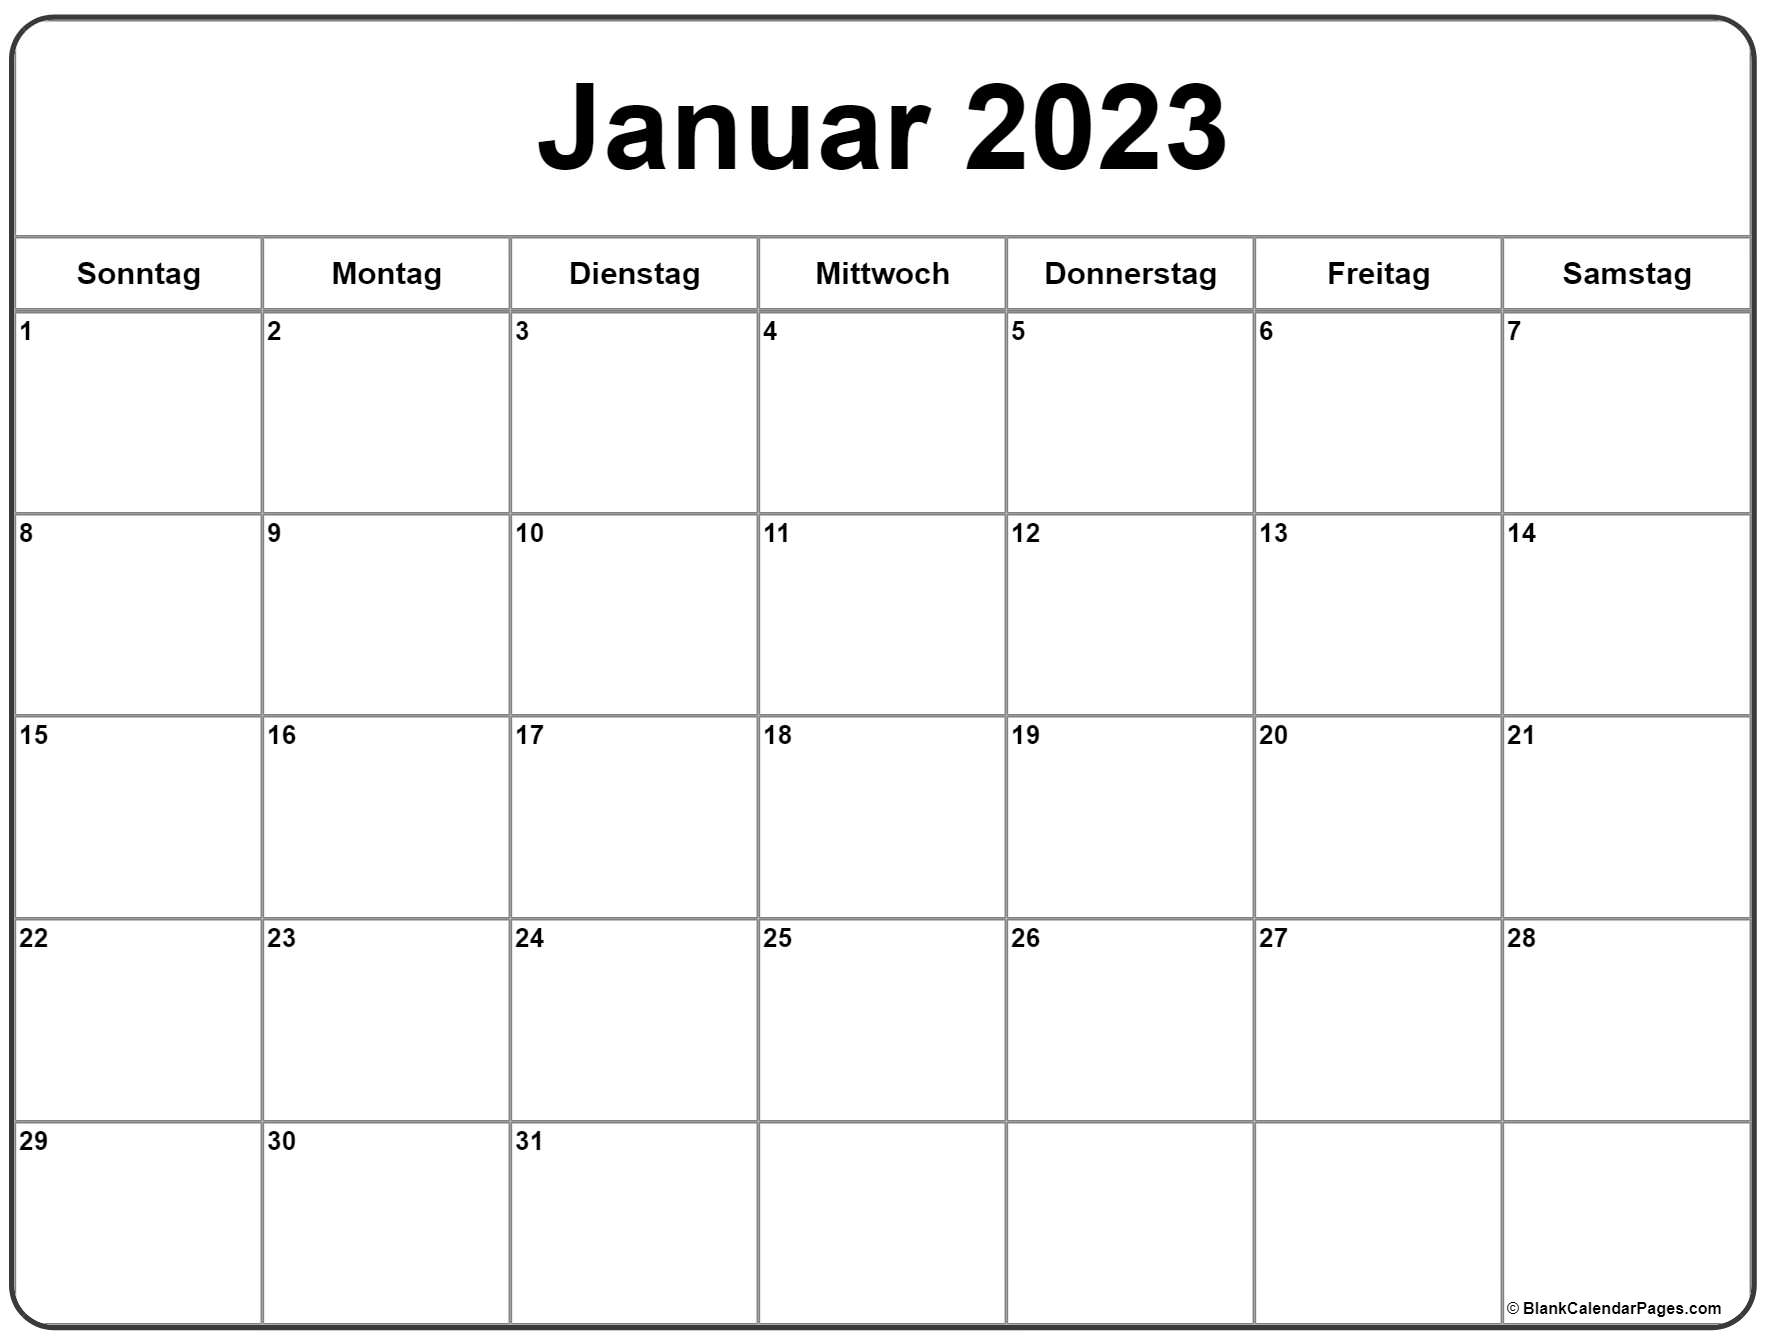 Januar 2023 kalender